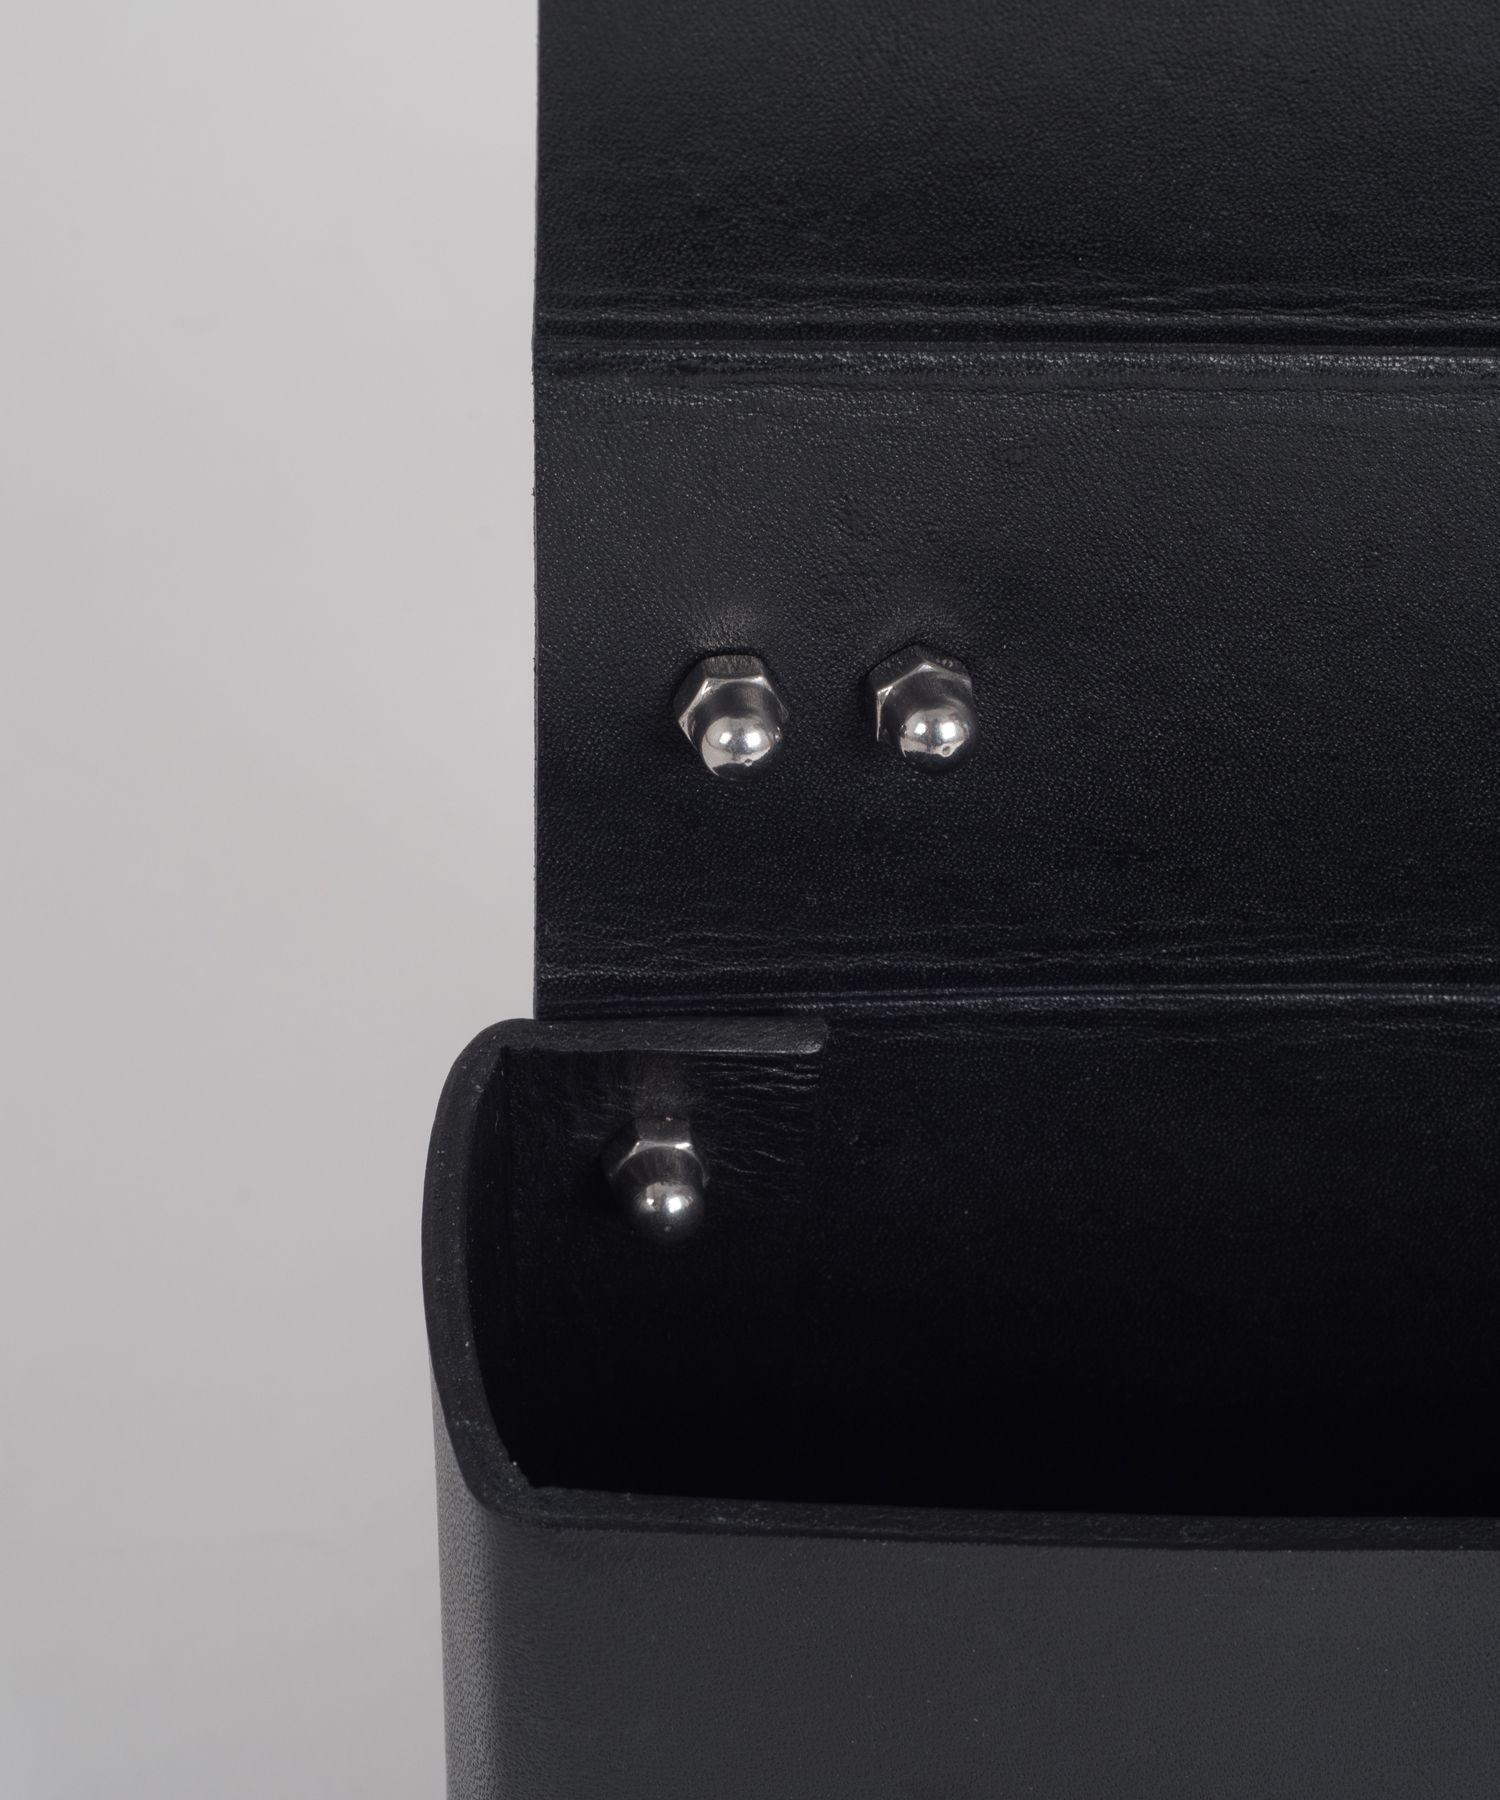 Black MECANO Nº2 inside detail by LESS BORE   #handmade #eco #Leather #cowhide #luxury #LessBore #handbag #slowfashion